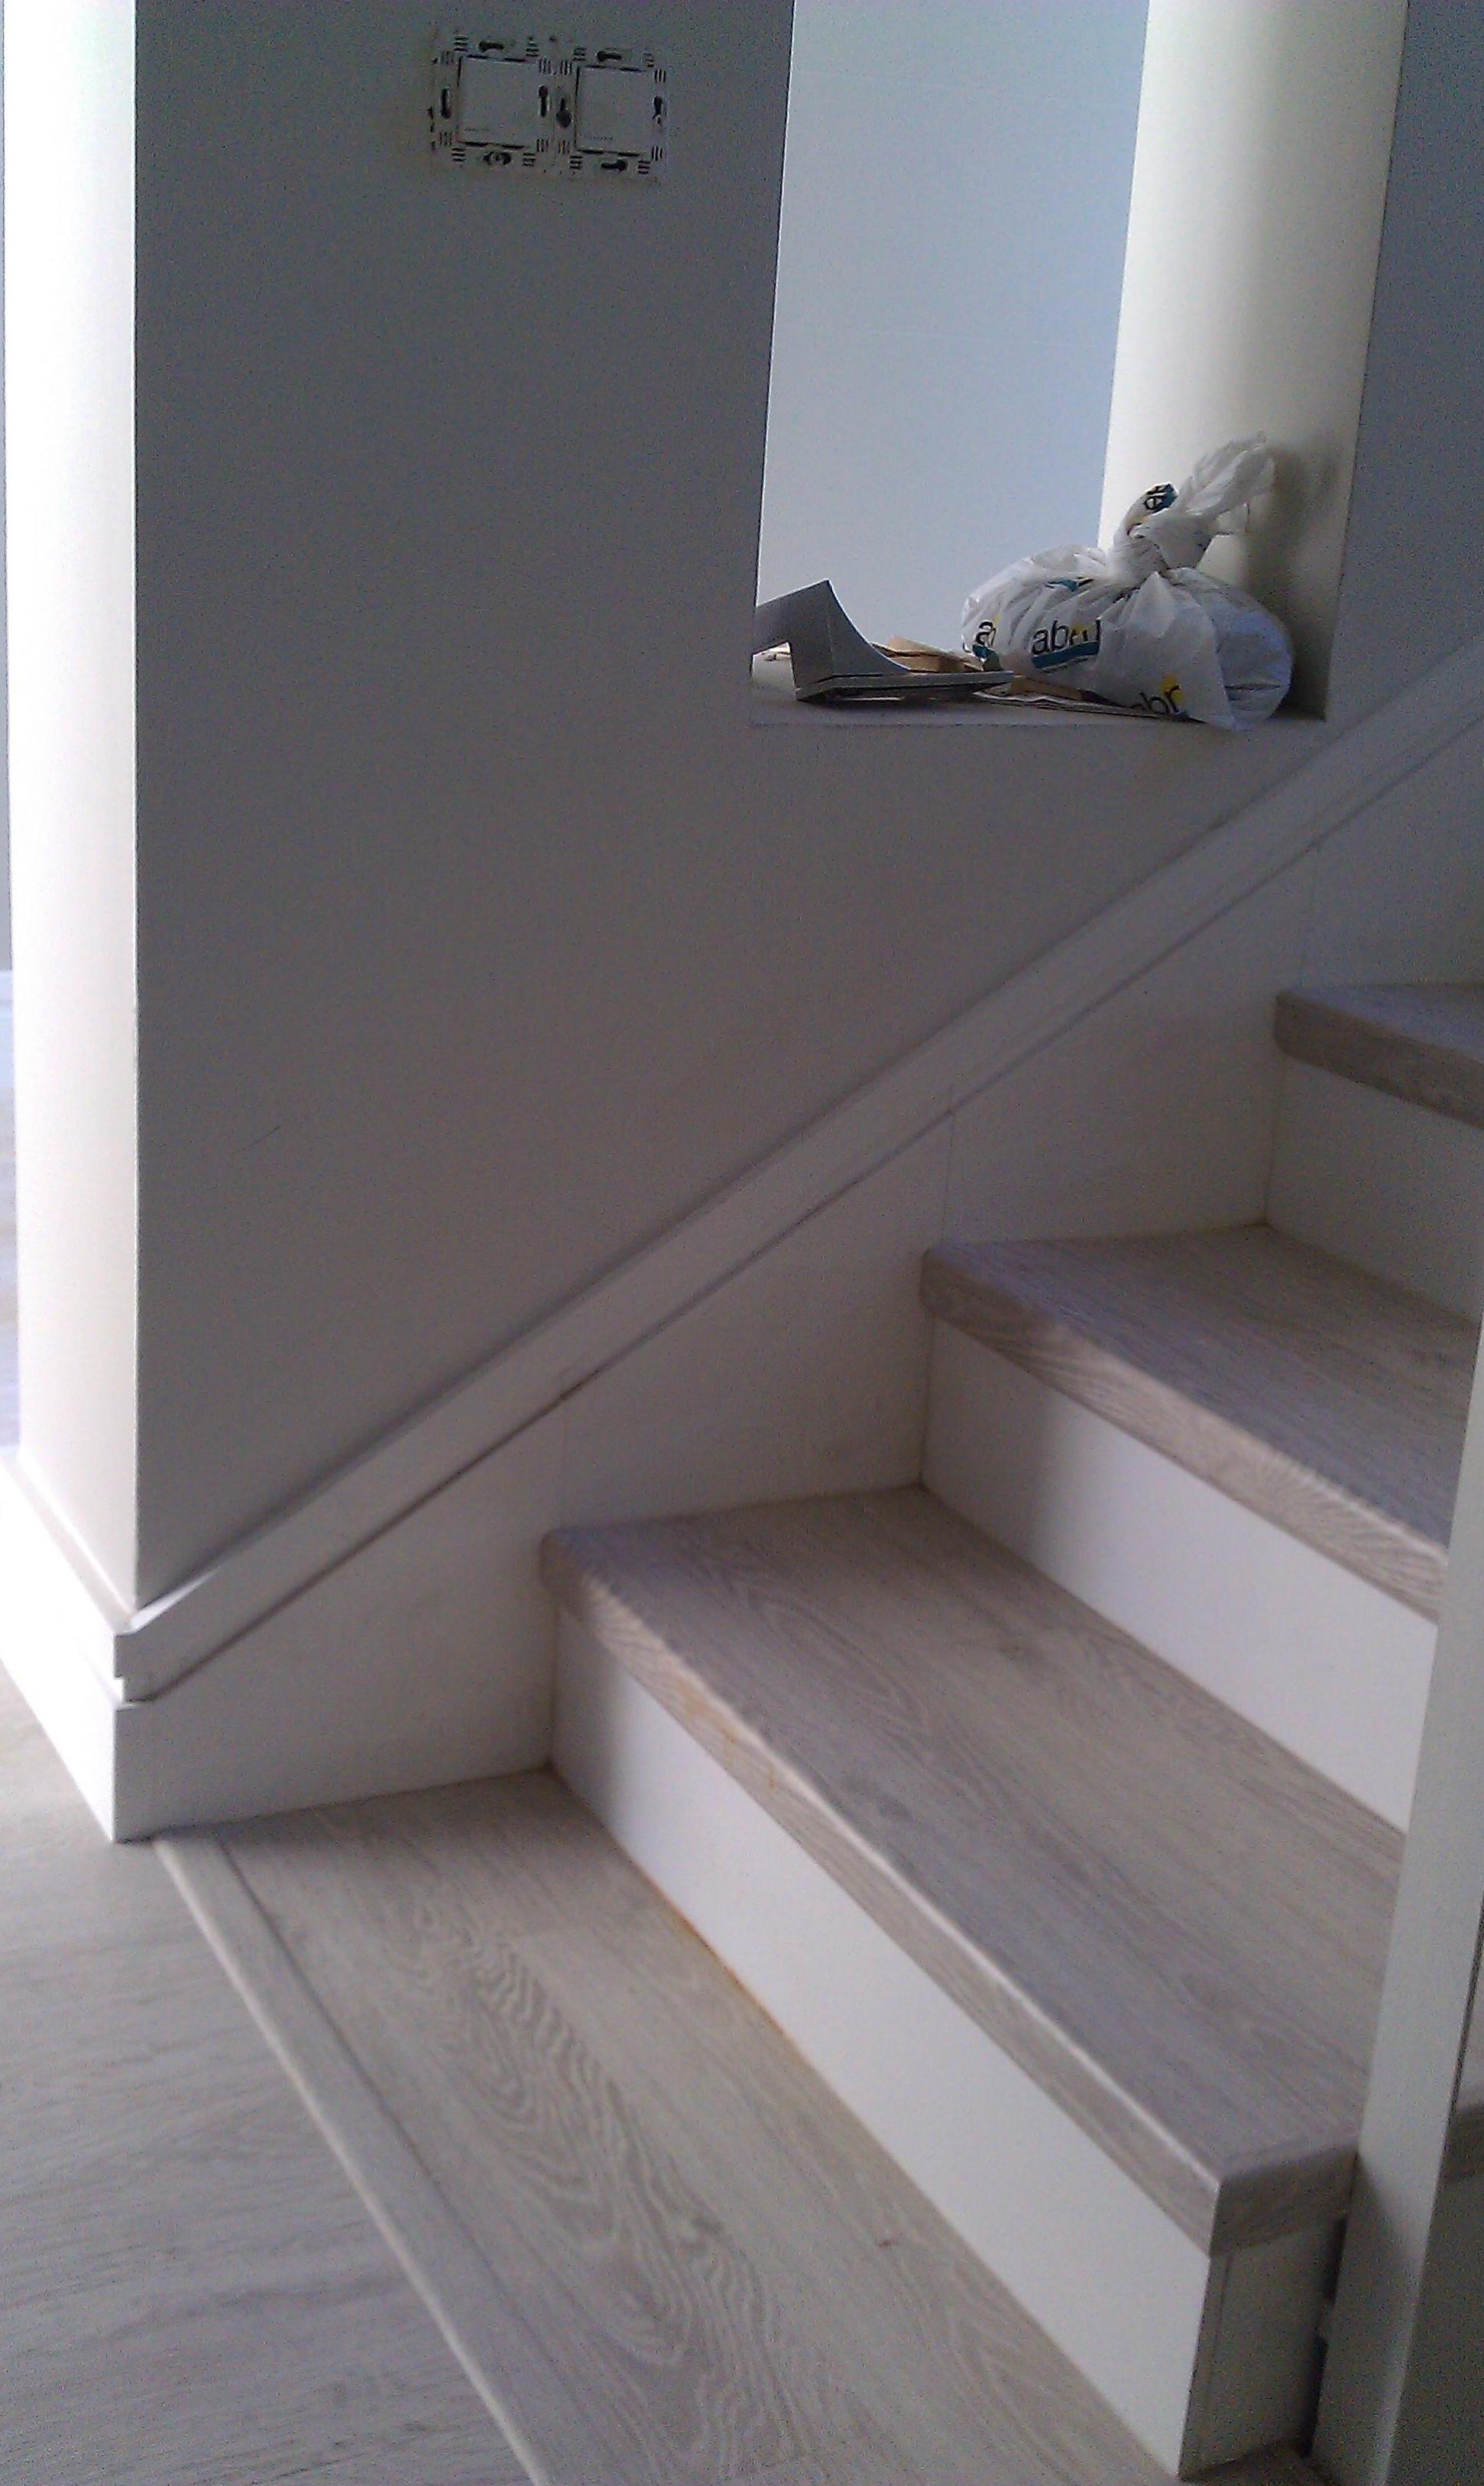 Carpintería Plasencia/Corte de letras en Madera Plasencia/corte de letras en pvc en Plasencia/corte de letras en Aluminio en Plasencia